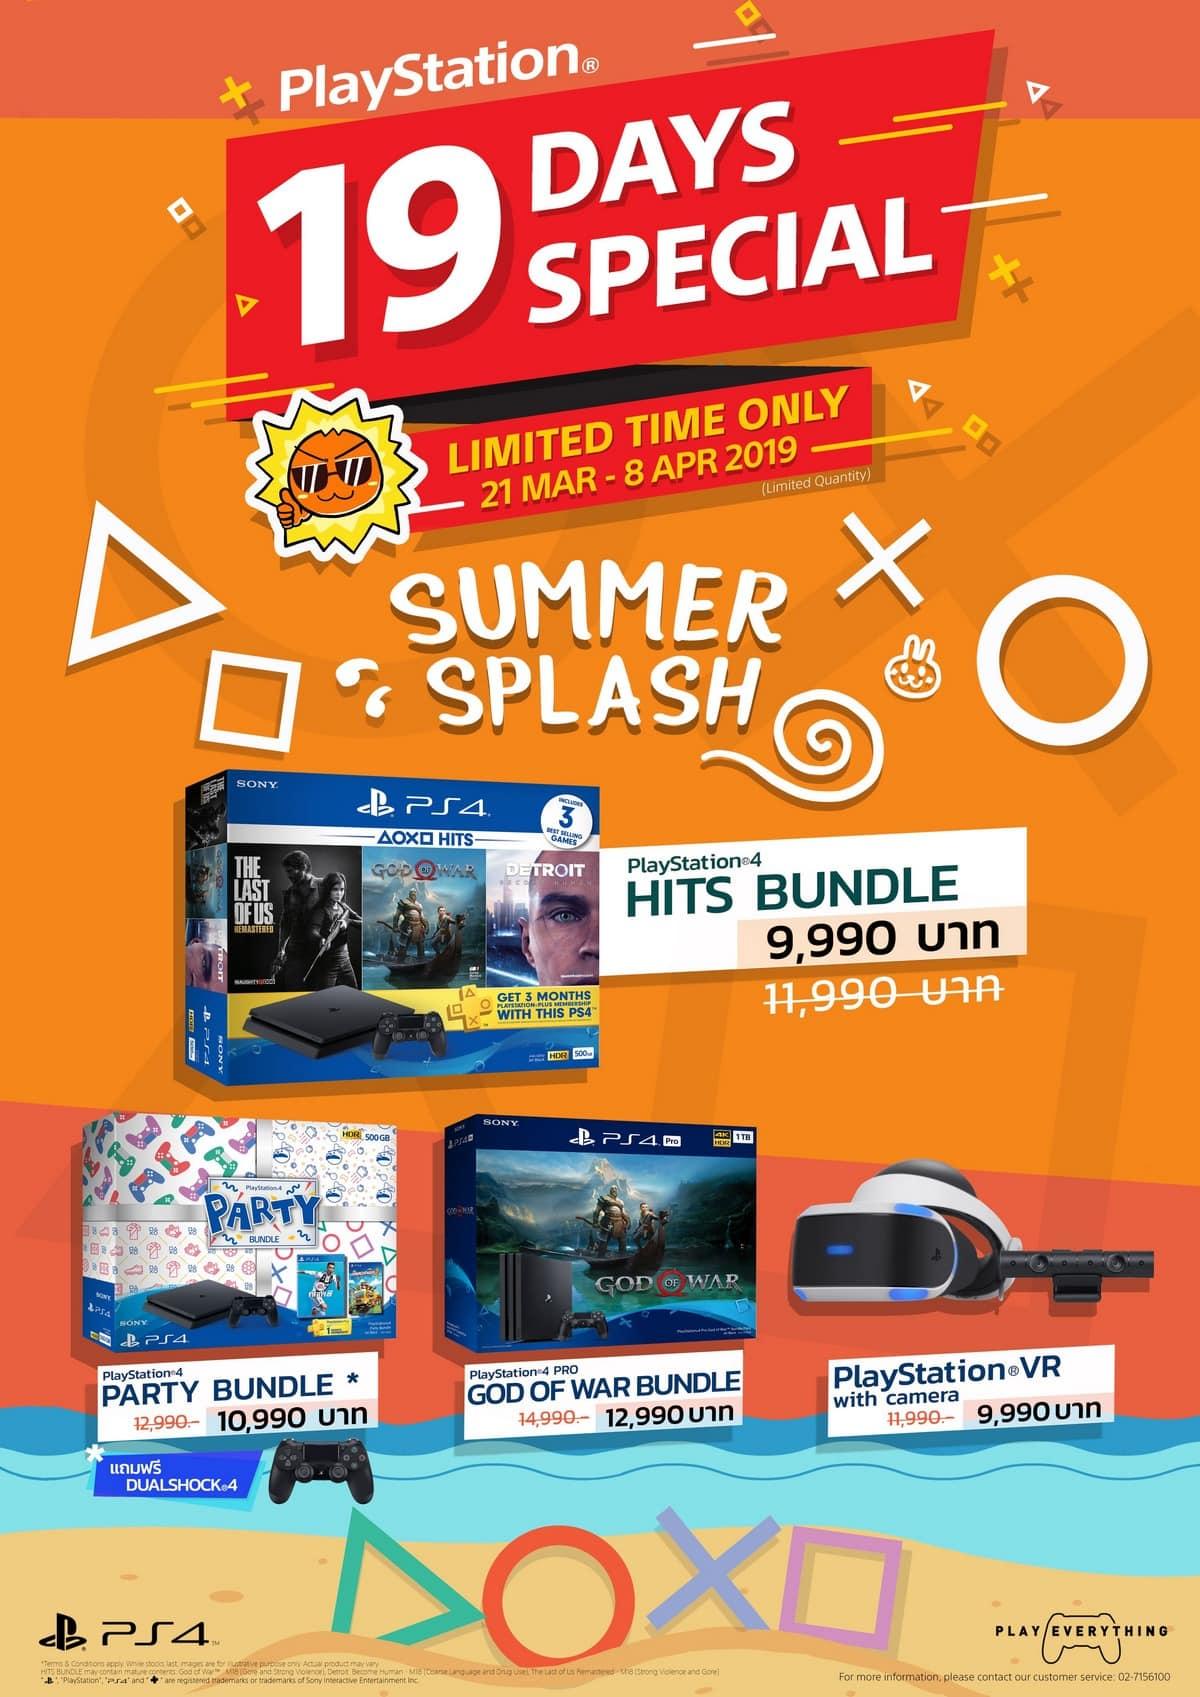 "Summer Splash A2 Final - โซนี่จัดโปรโมชั่น ""19 Days Special"" ลดราคา PlayStation 4 เริ่มต้น 9,990 บาท"